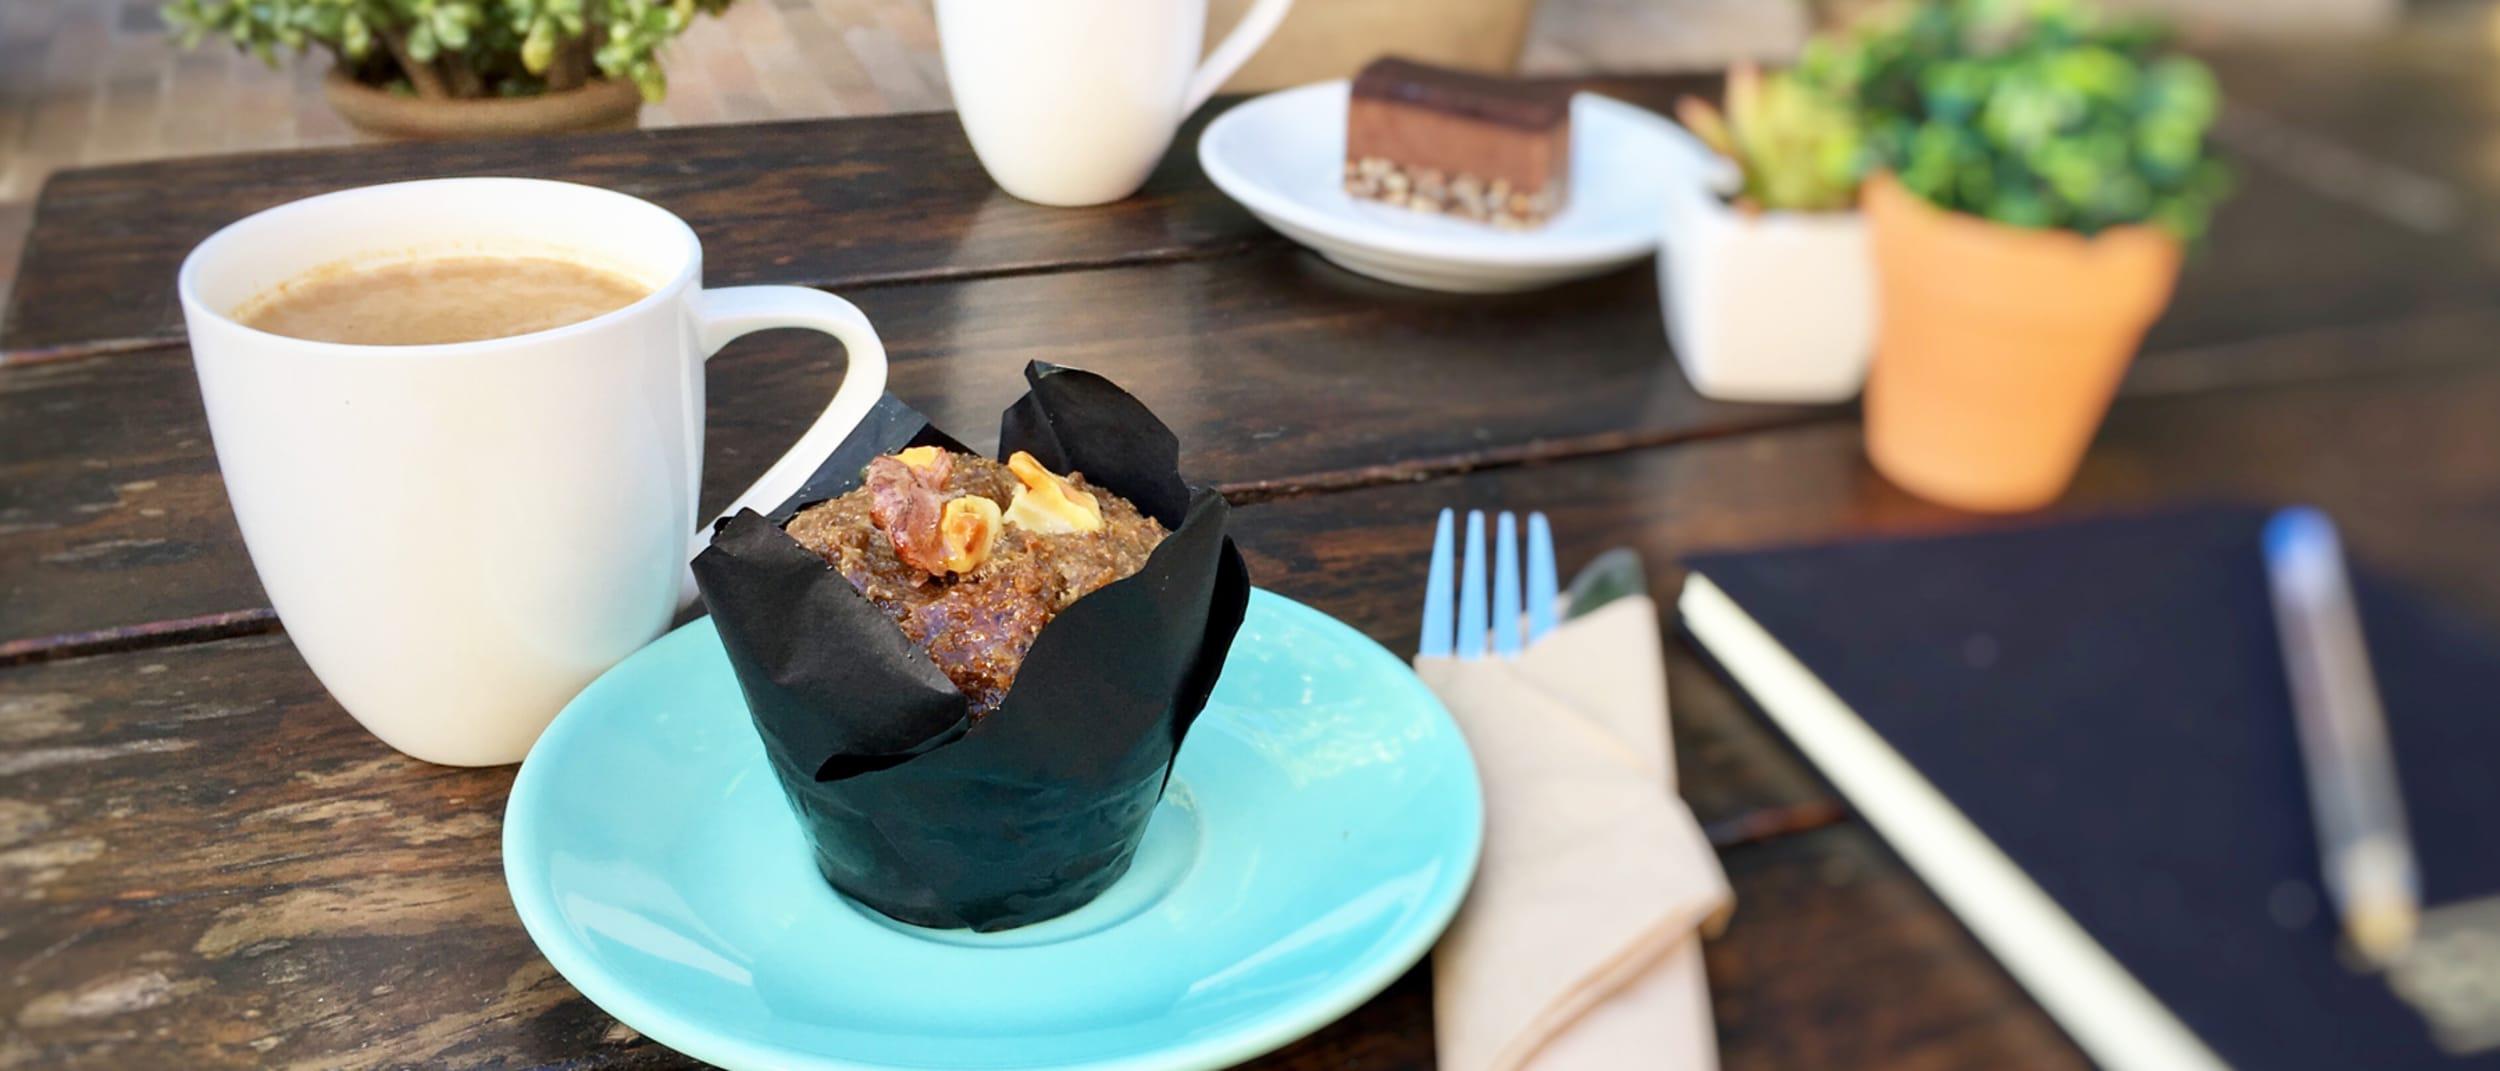 Organic Vegan Date and Walnut Muffin and Chai